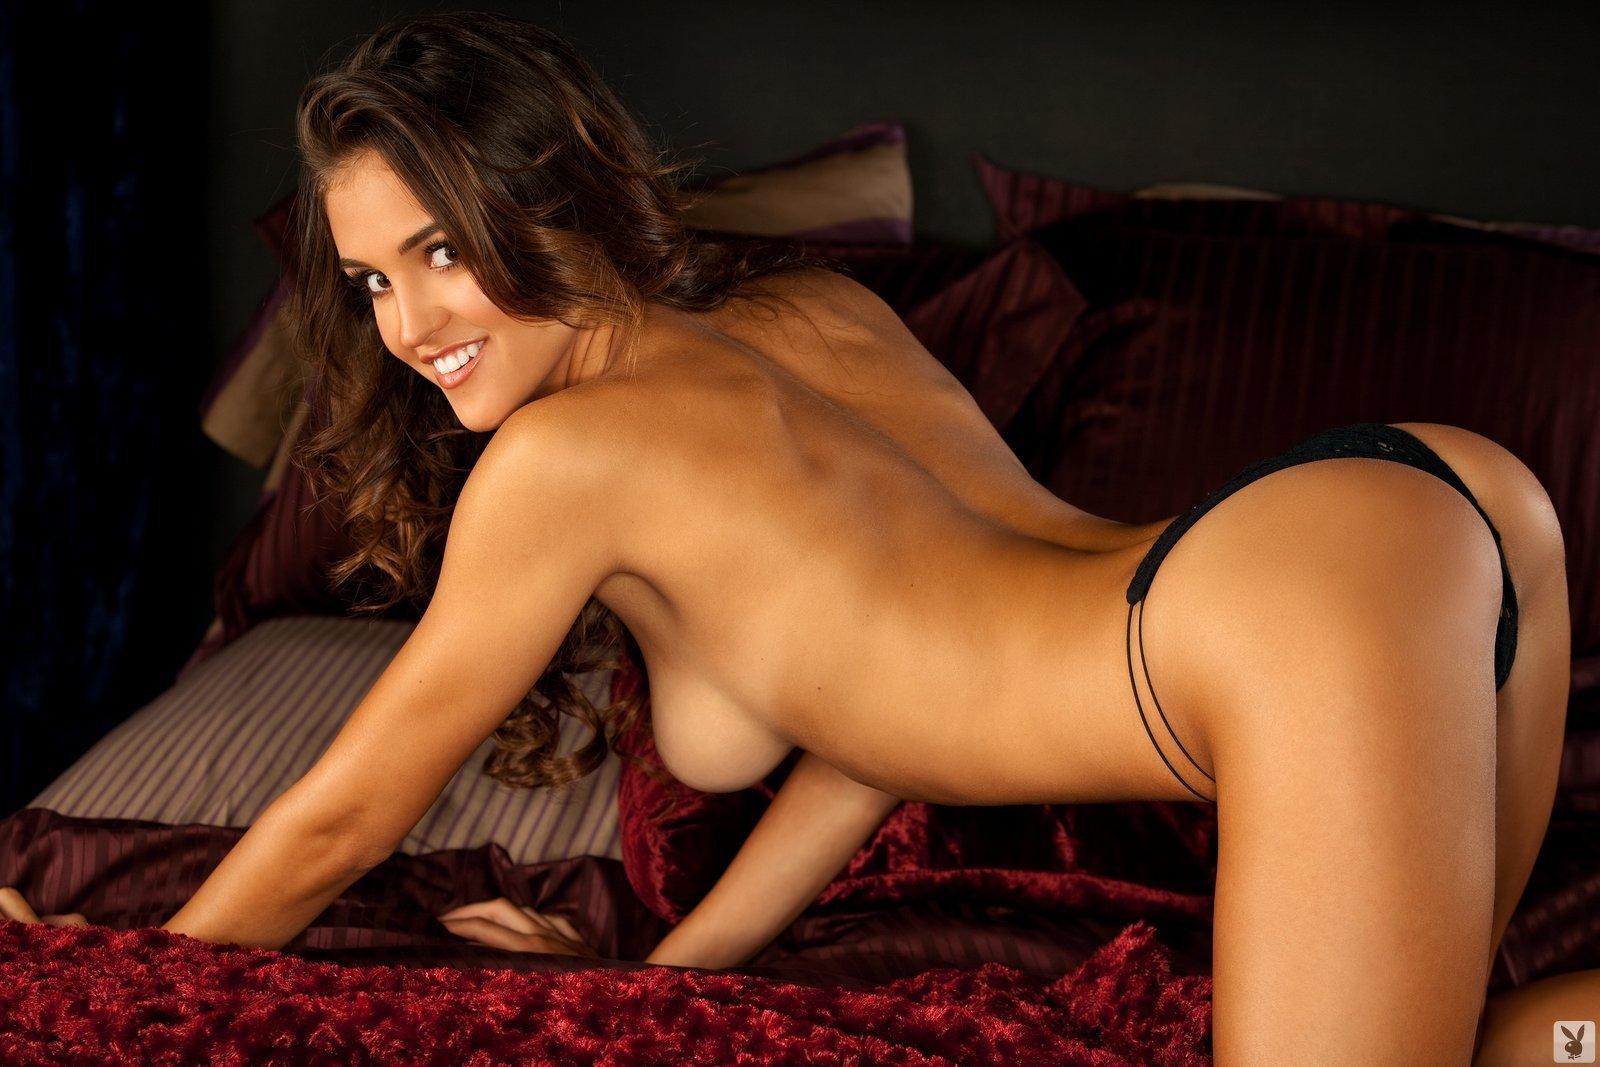 Jacqueline fernandez naked celebrity